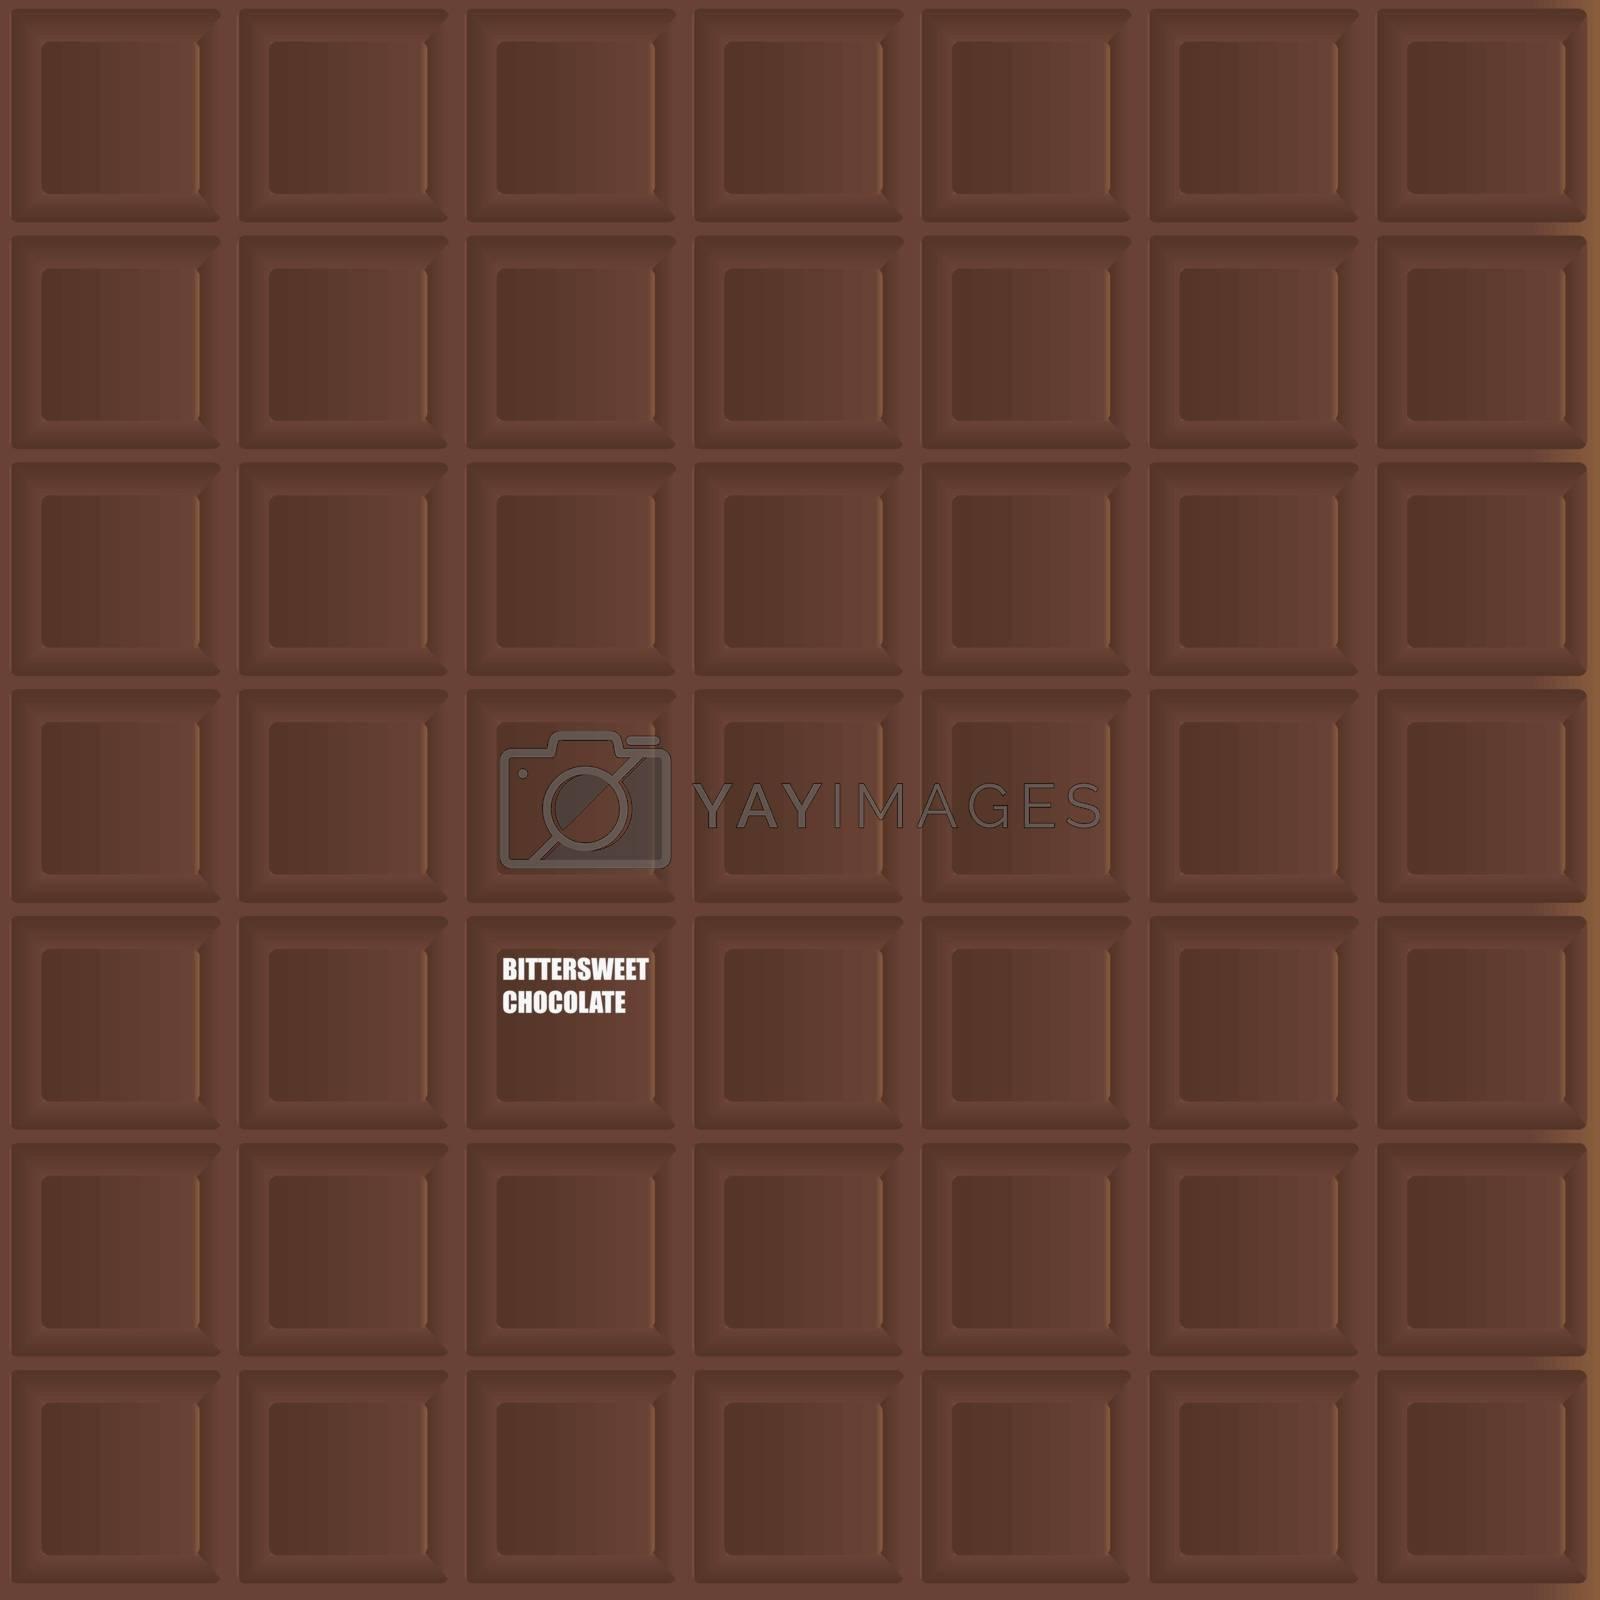 Dark chocolate bar as background. Vector illustration.